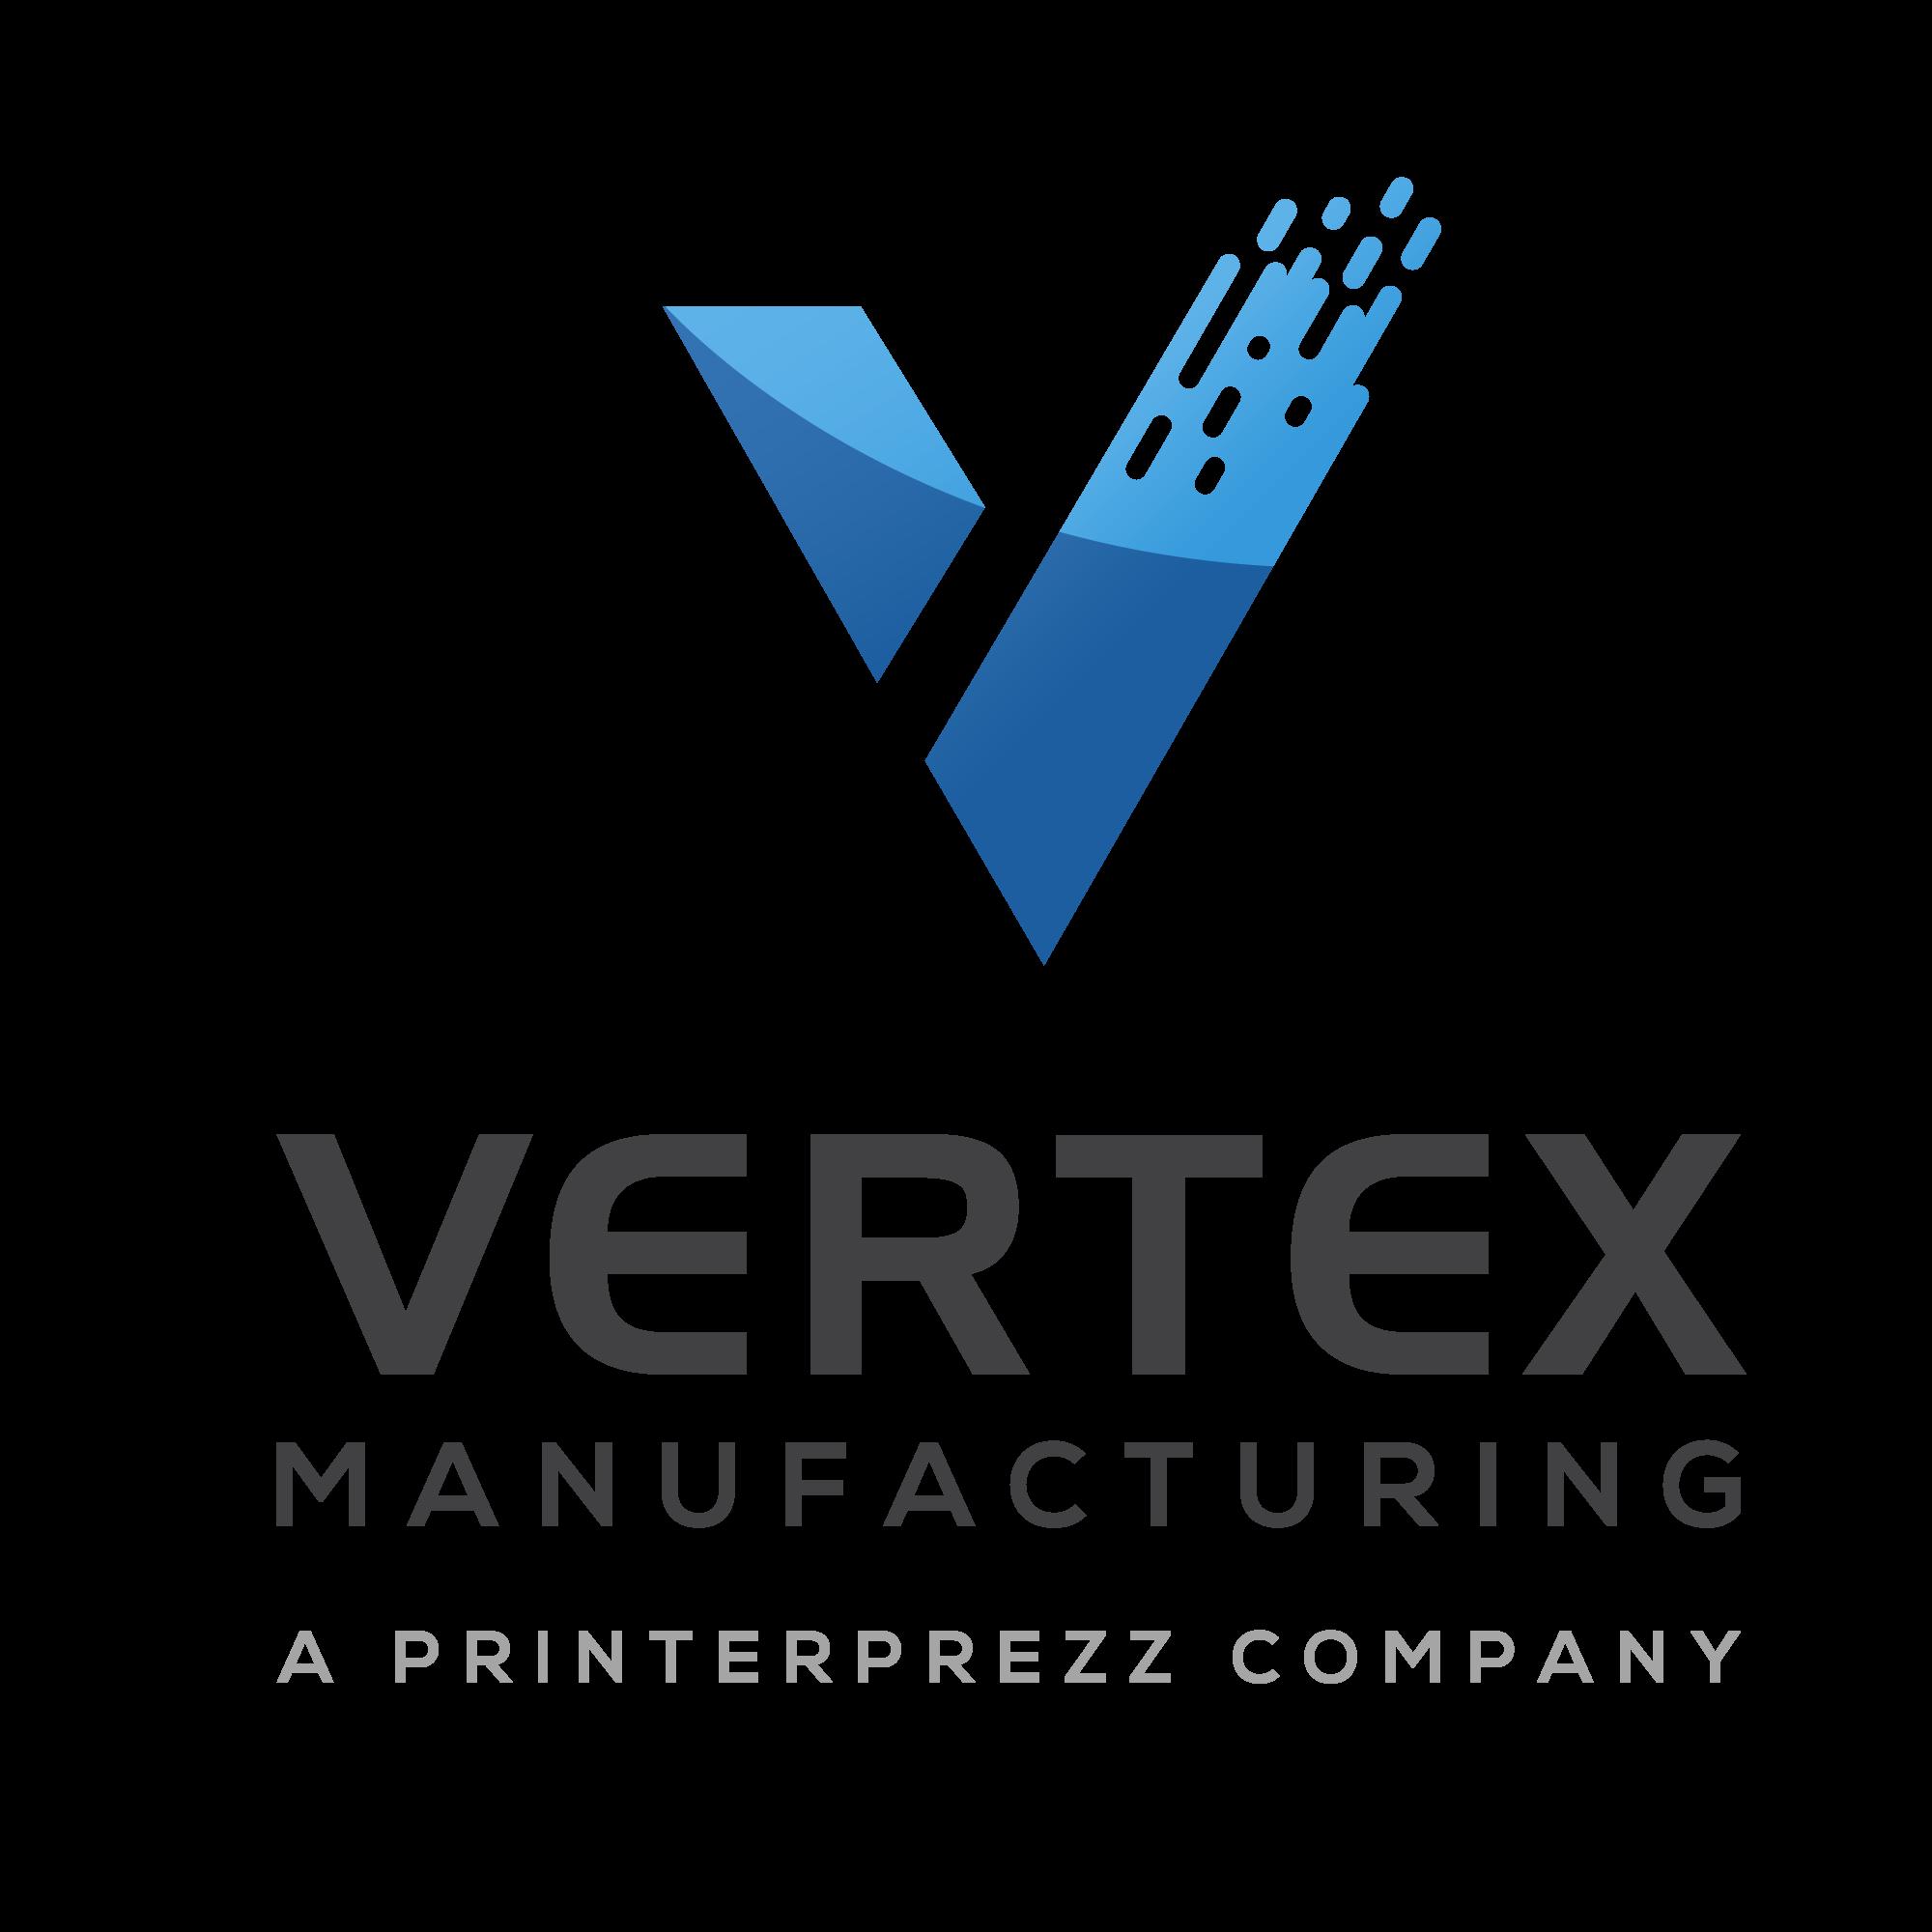 VertexManufacturing-Logo-2021-Centered-2021